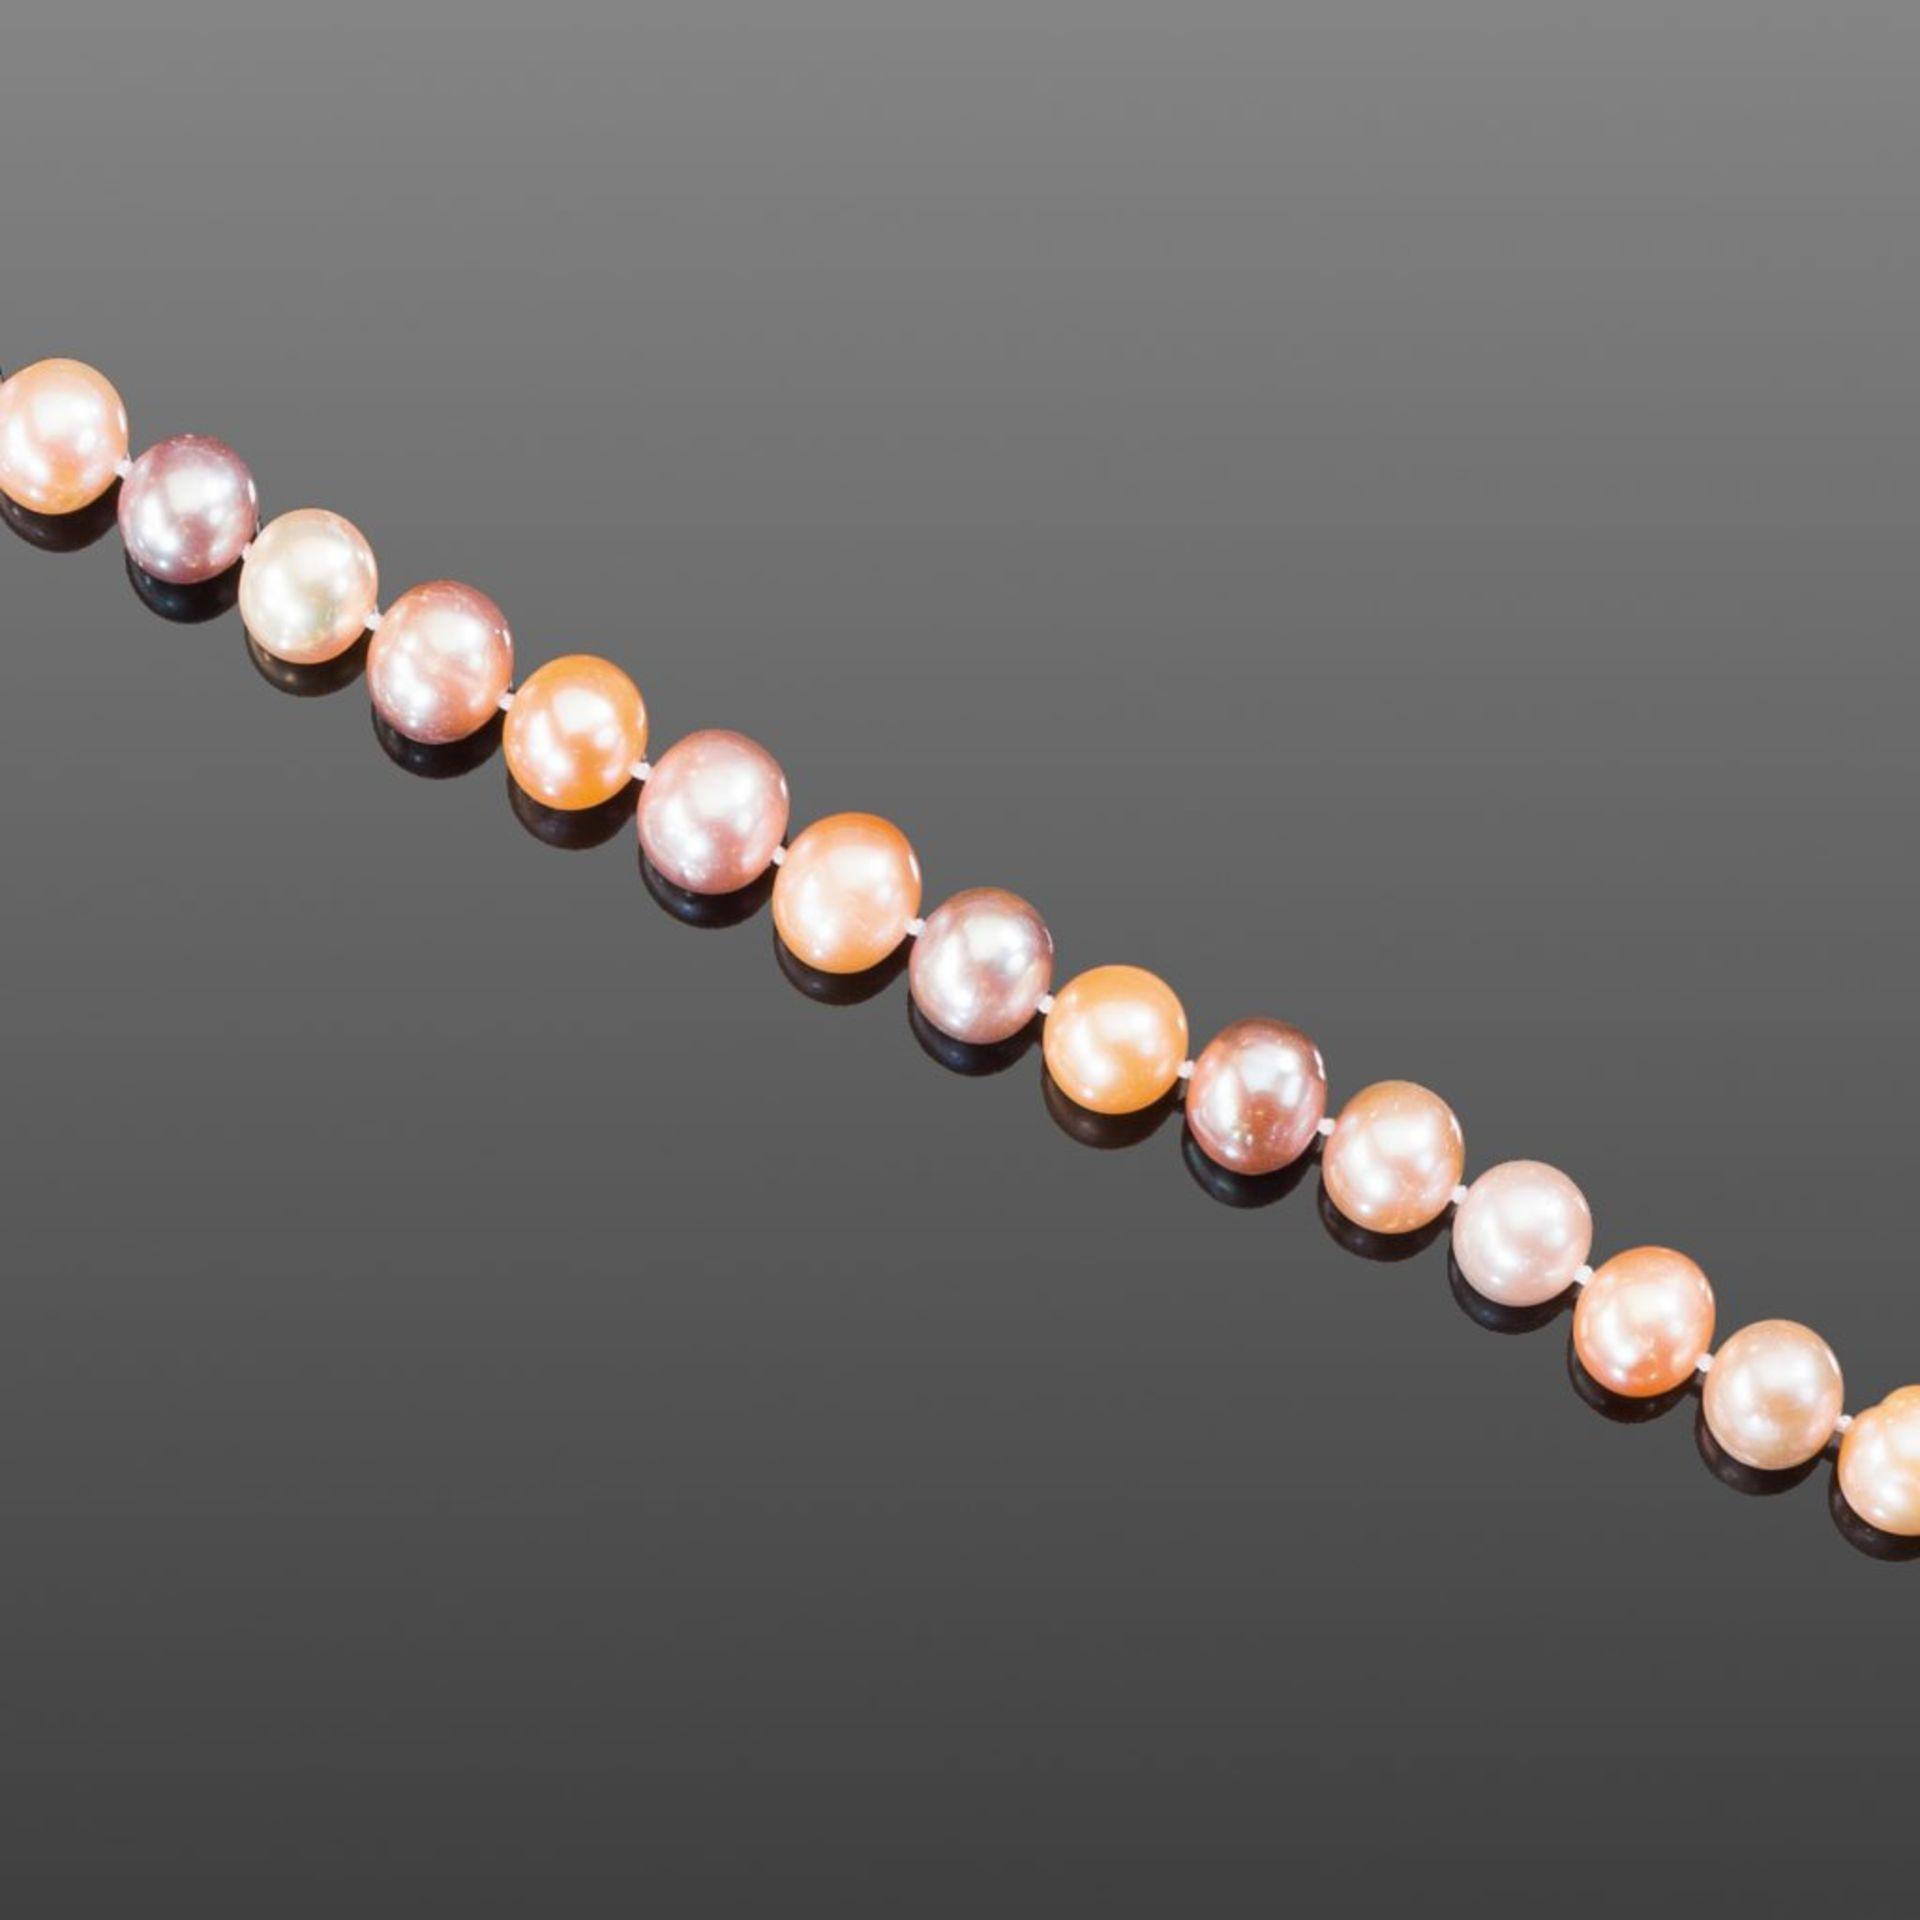 Süßwasser-Zuchtperlenkette. Perlen in zarten Pastelltönen, Ø 11 - 12 mm. Kugelschloss in 14 ct.